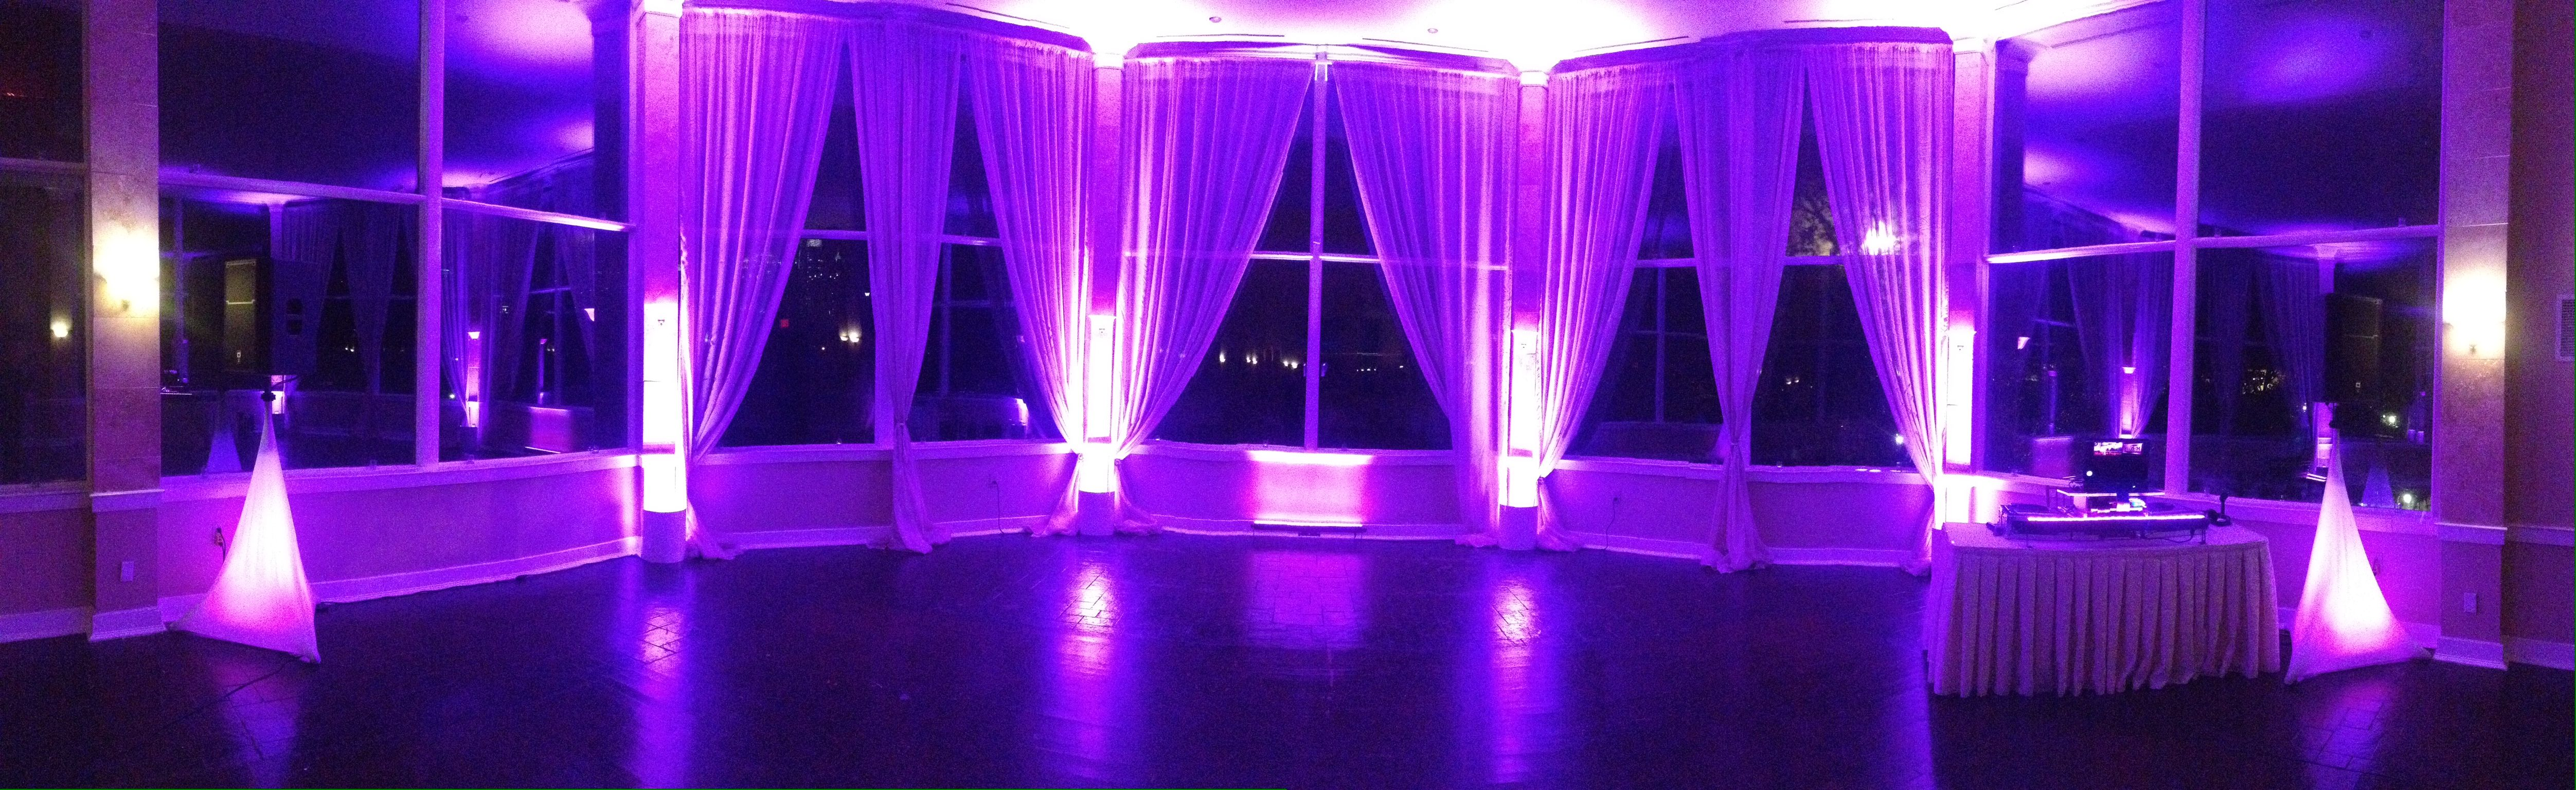 Up Lighting At The Piedmont Room Park Tavern Atlanta Ga By Fonix Color Specialists Fonixentertainment Piedmontr Event Lighting Atlanta Wedding Wedding Dj